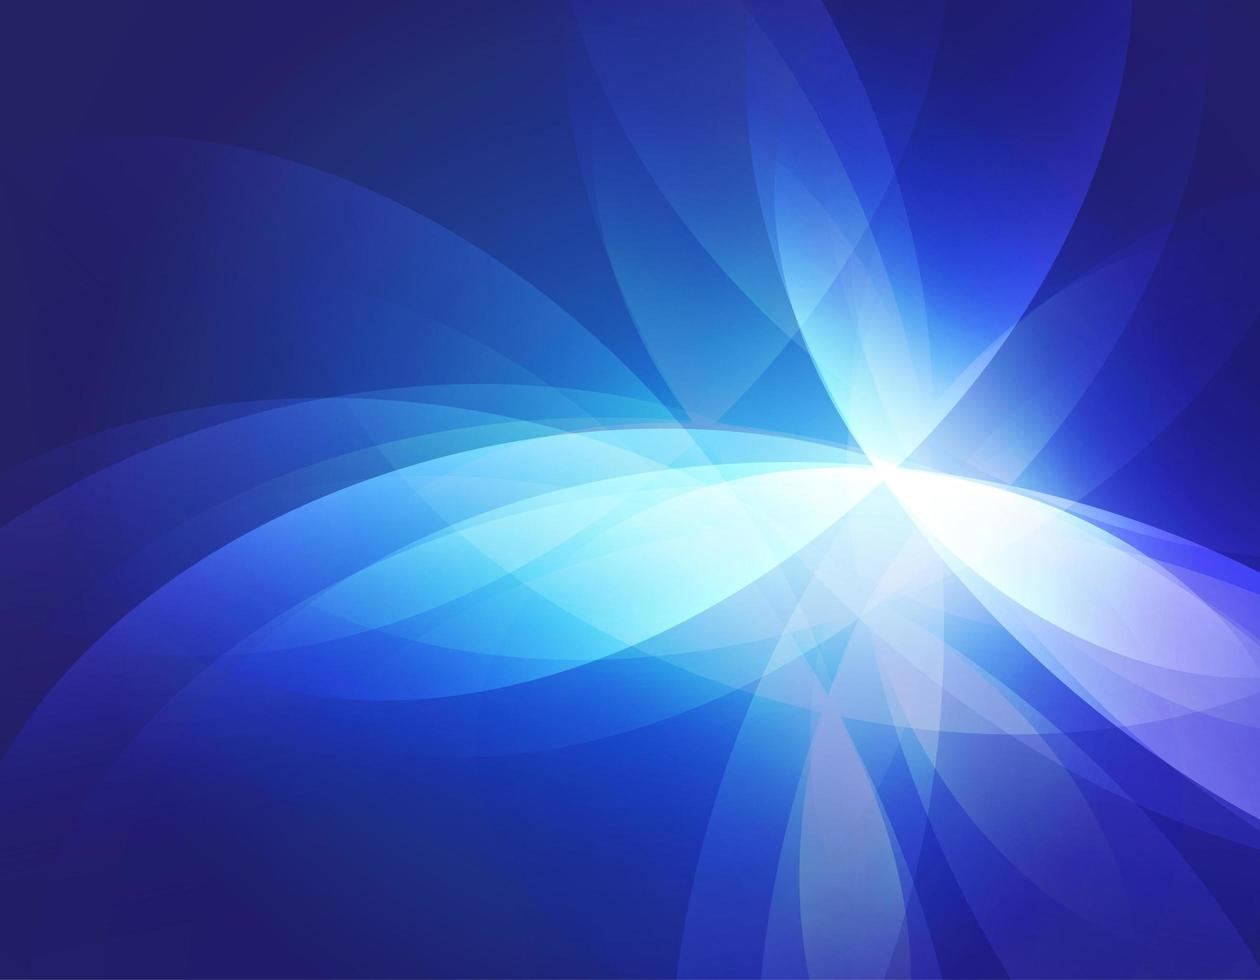 blauwe gloeiende abstracte achtergrond vector